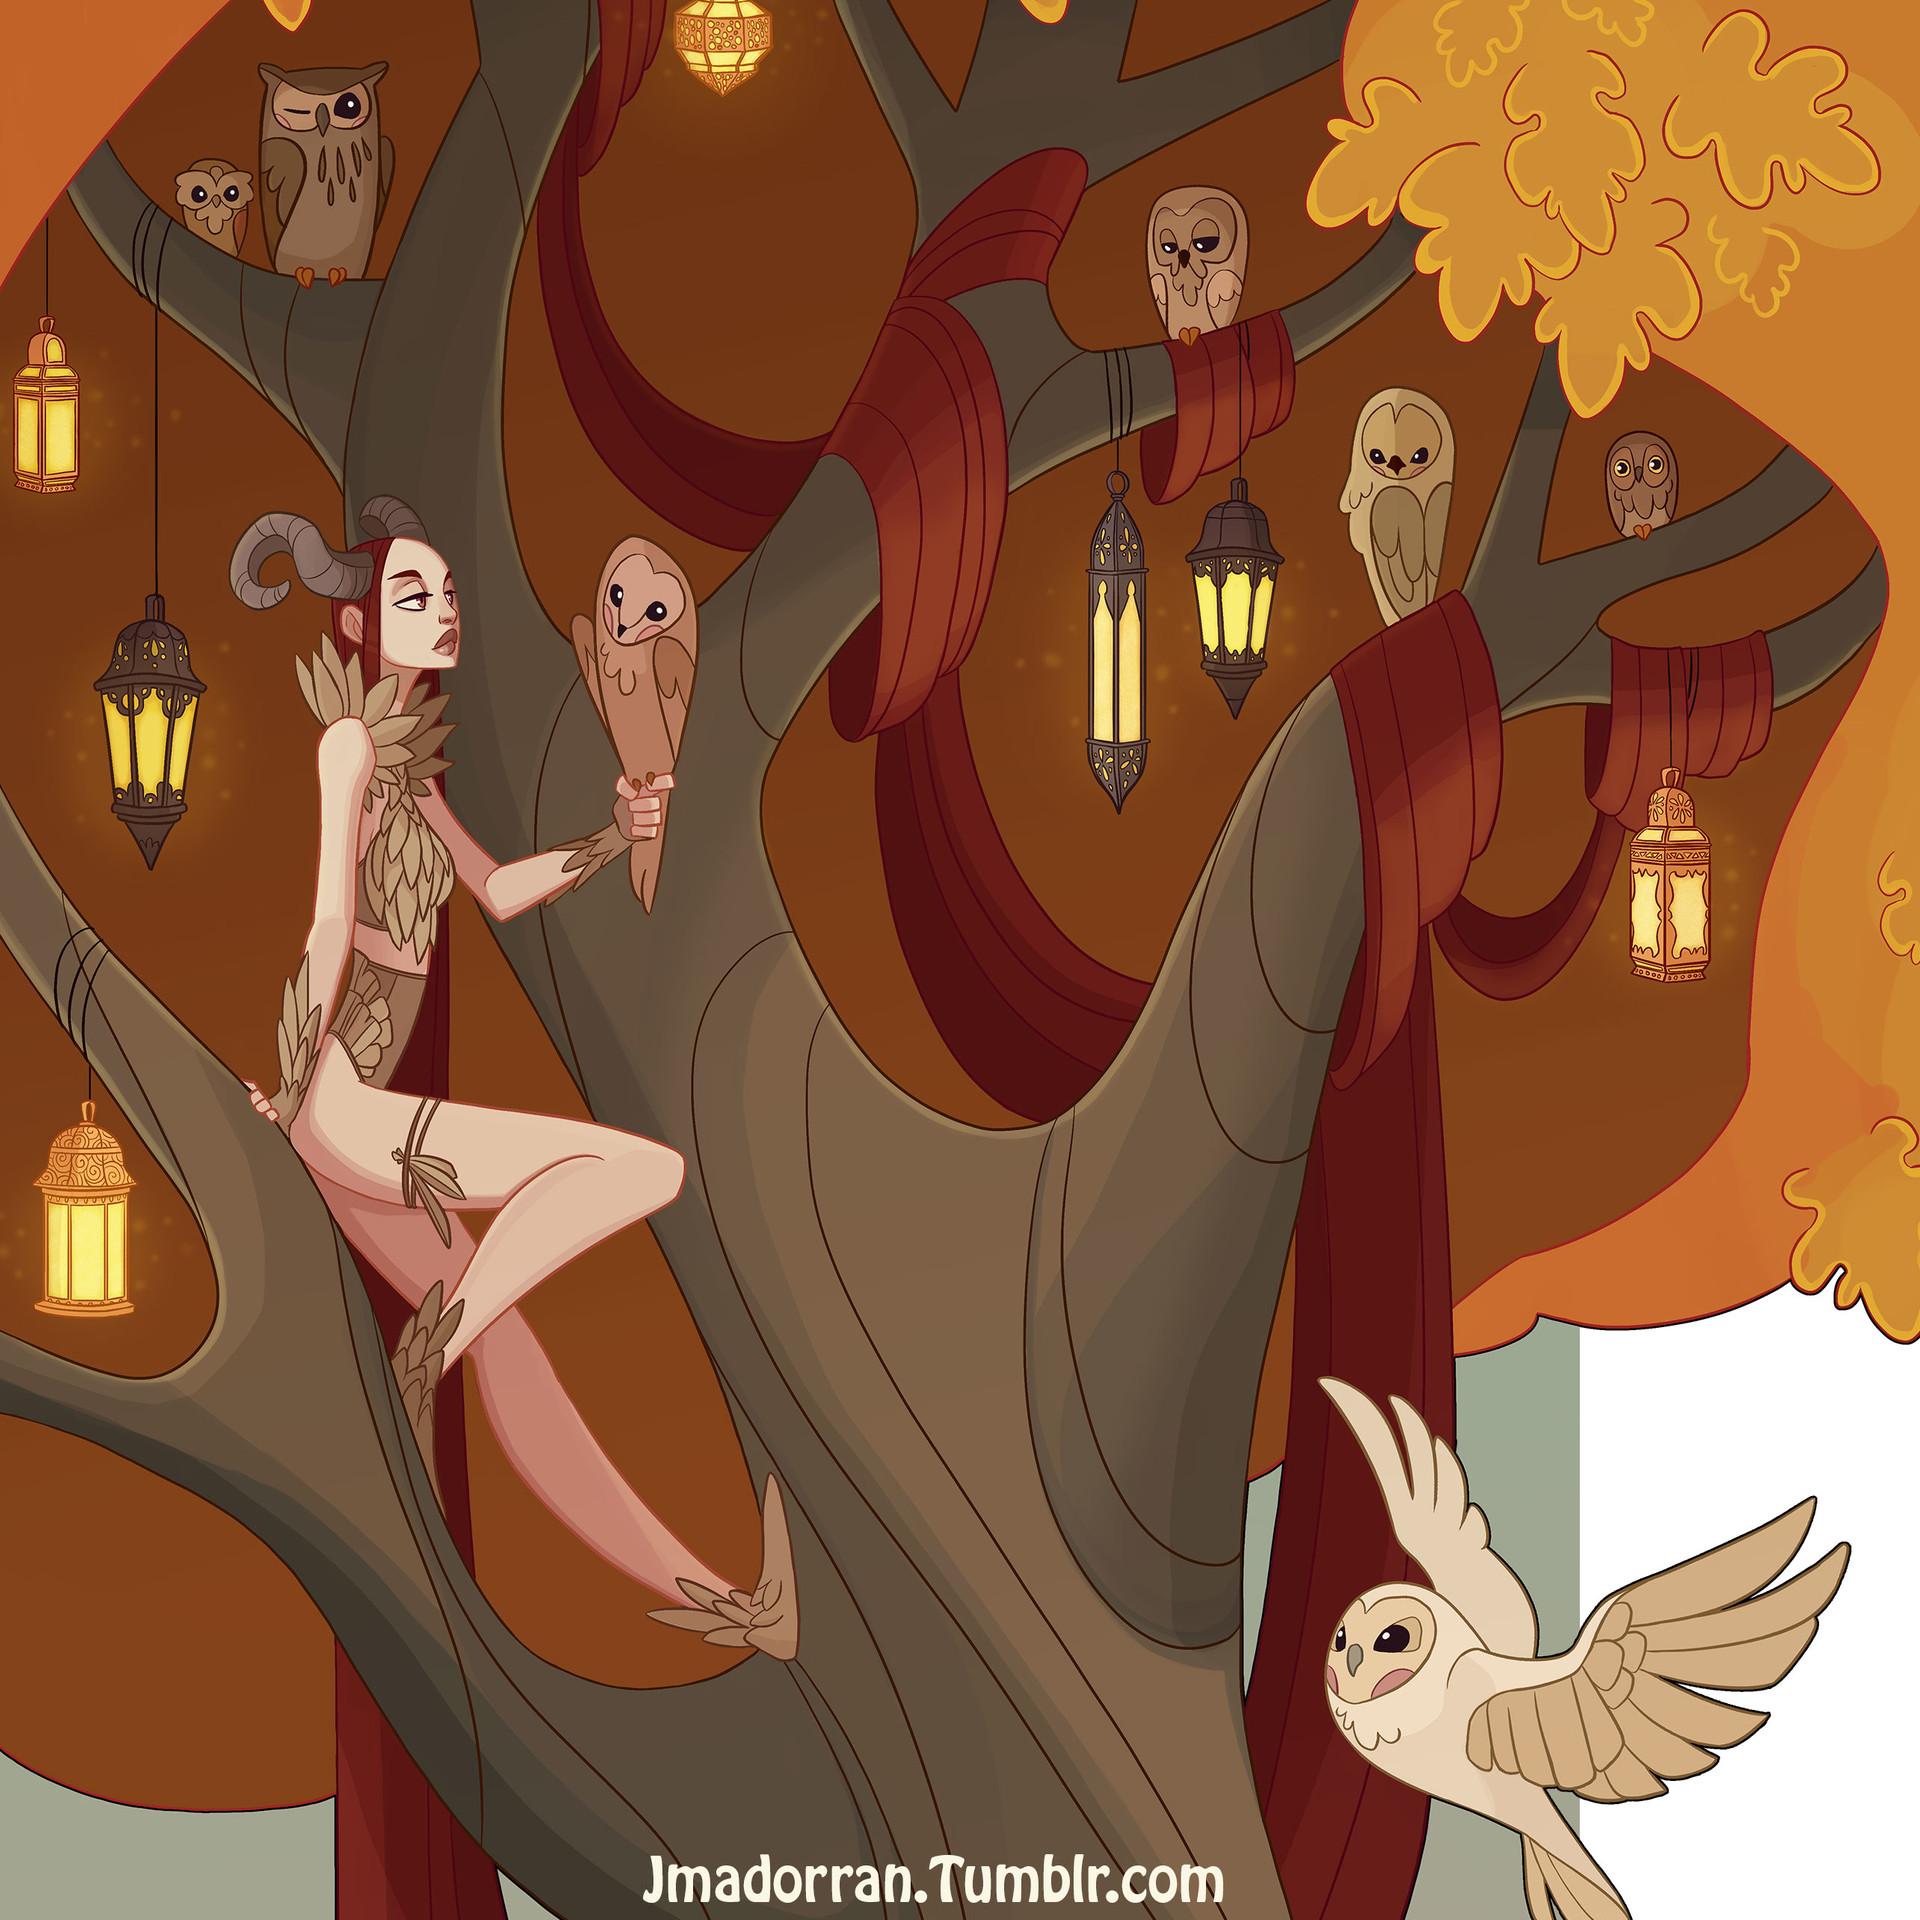 Jessica madorran character design fall tree 2016 blog closup 01